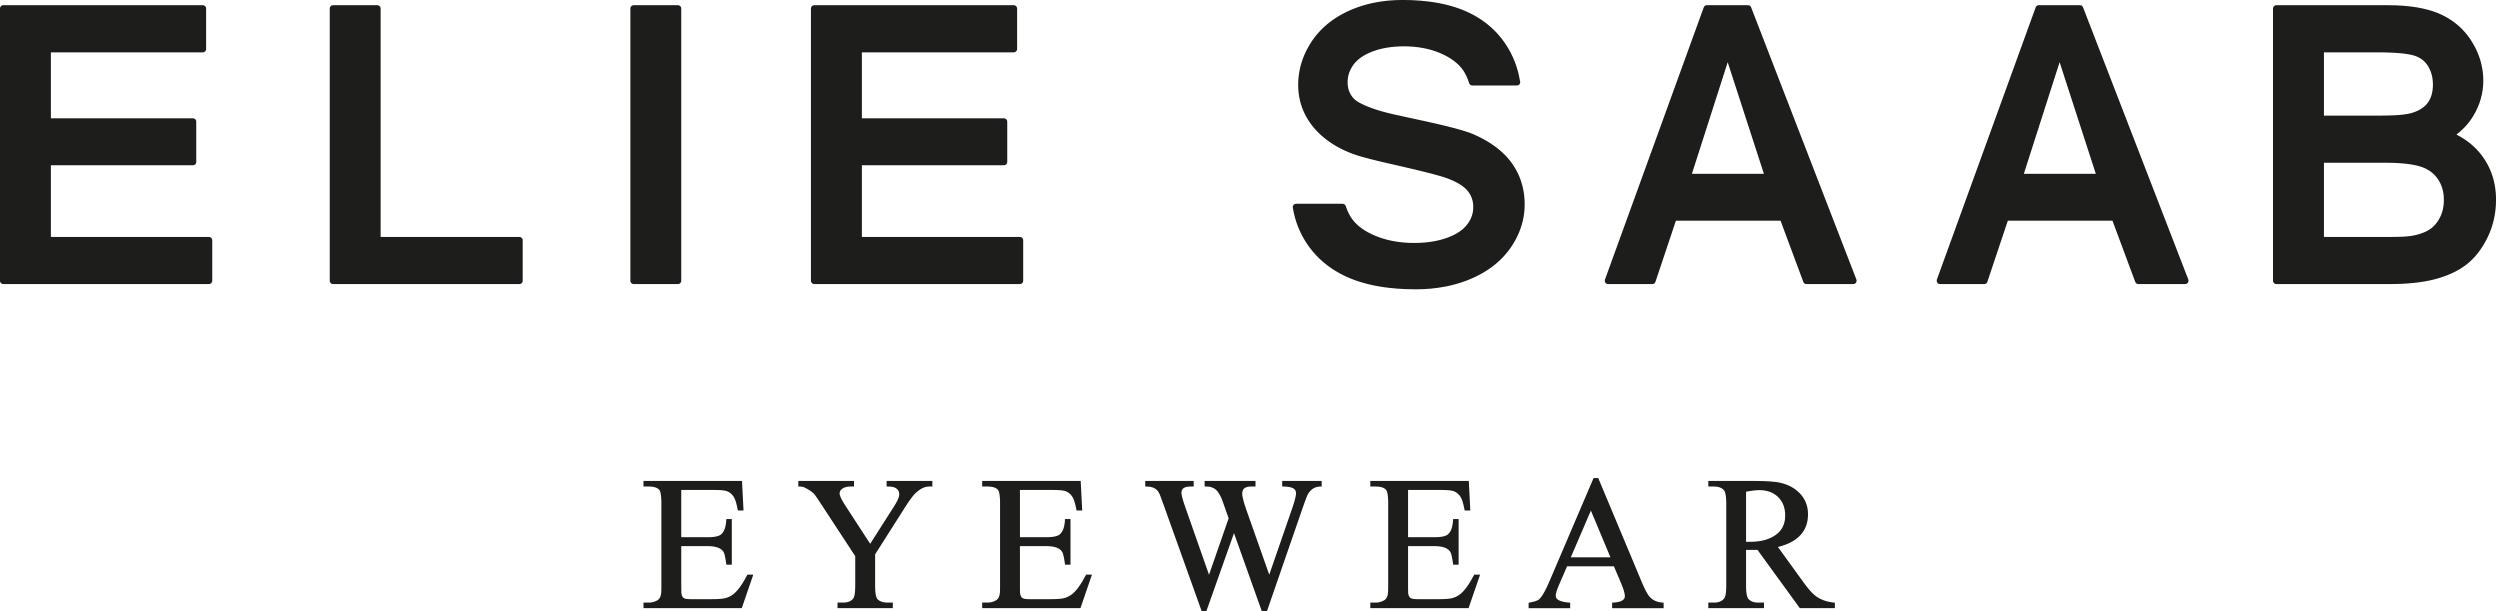 ES Eyewear